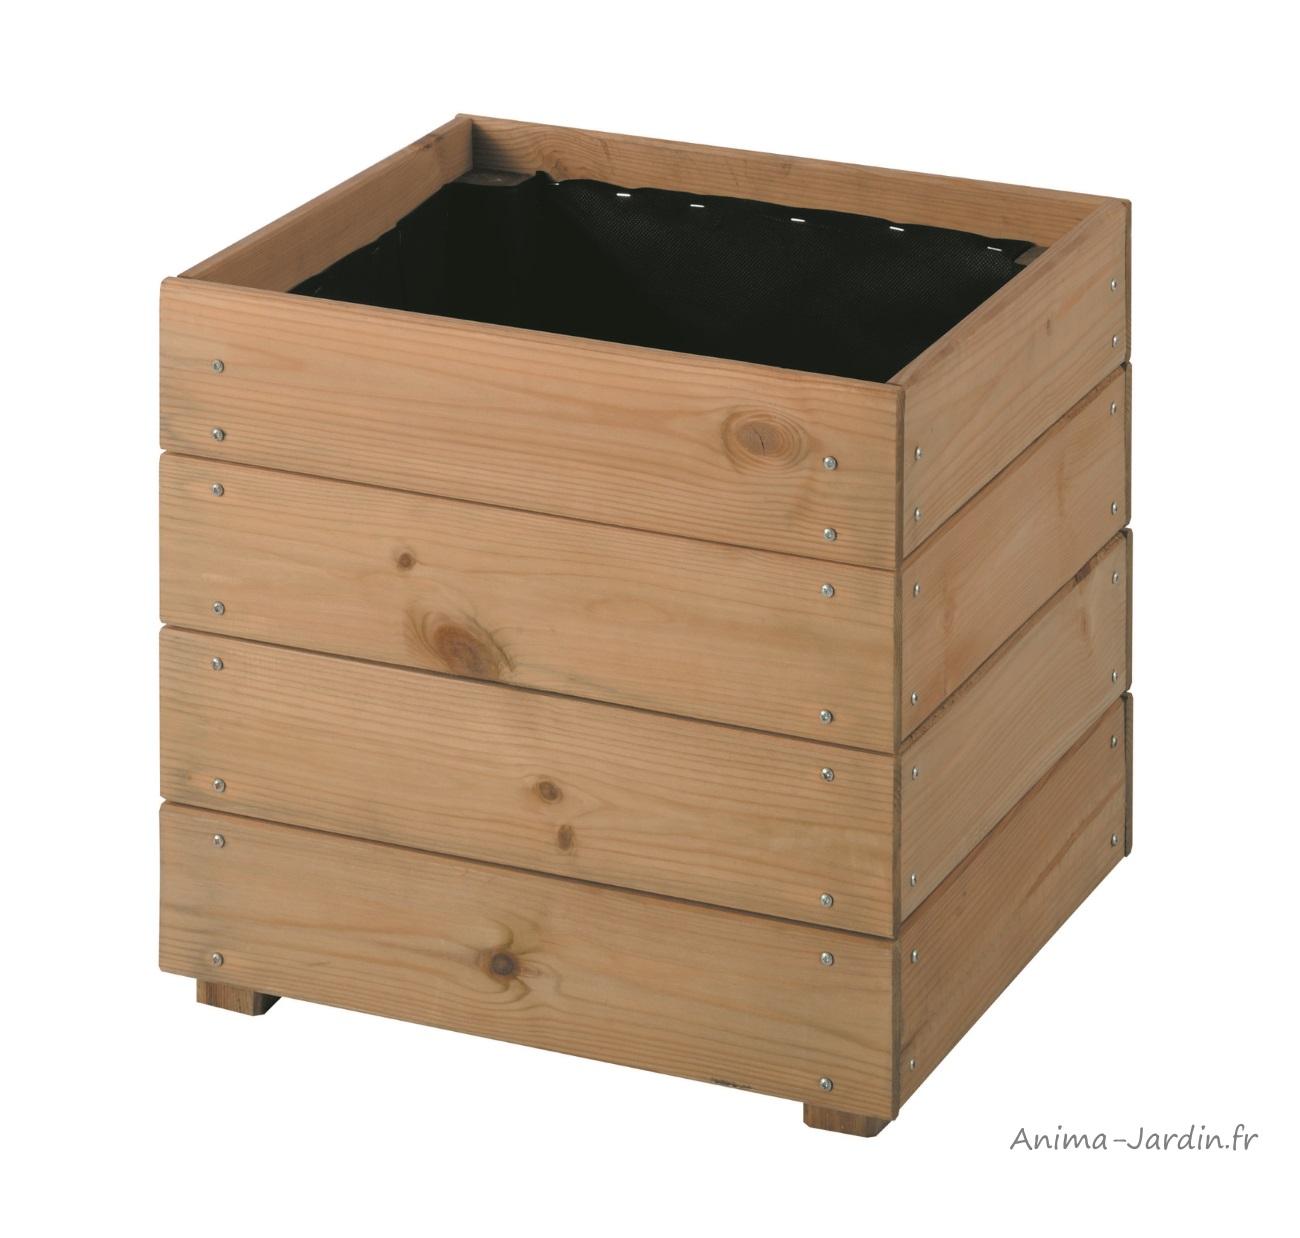 bac-essencia-40cm-bois-autoclave-fleurs-plantes-anima-jardin.fr